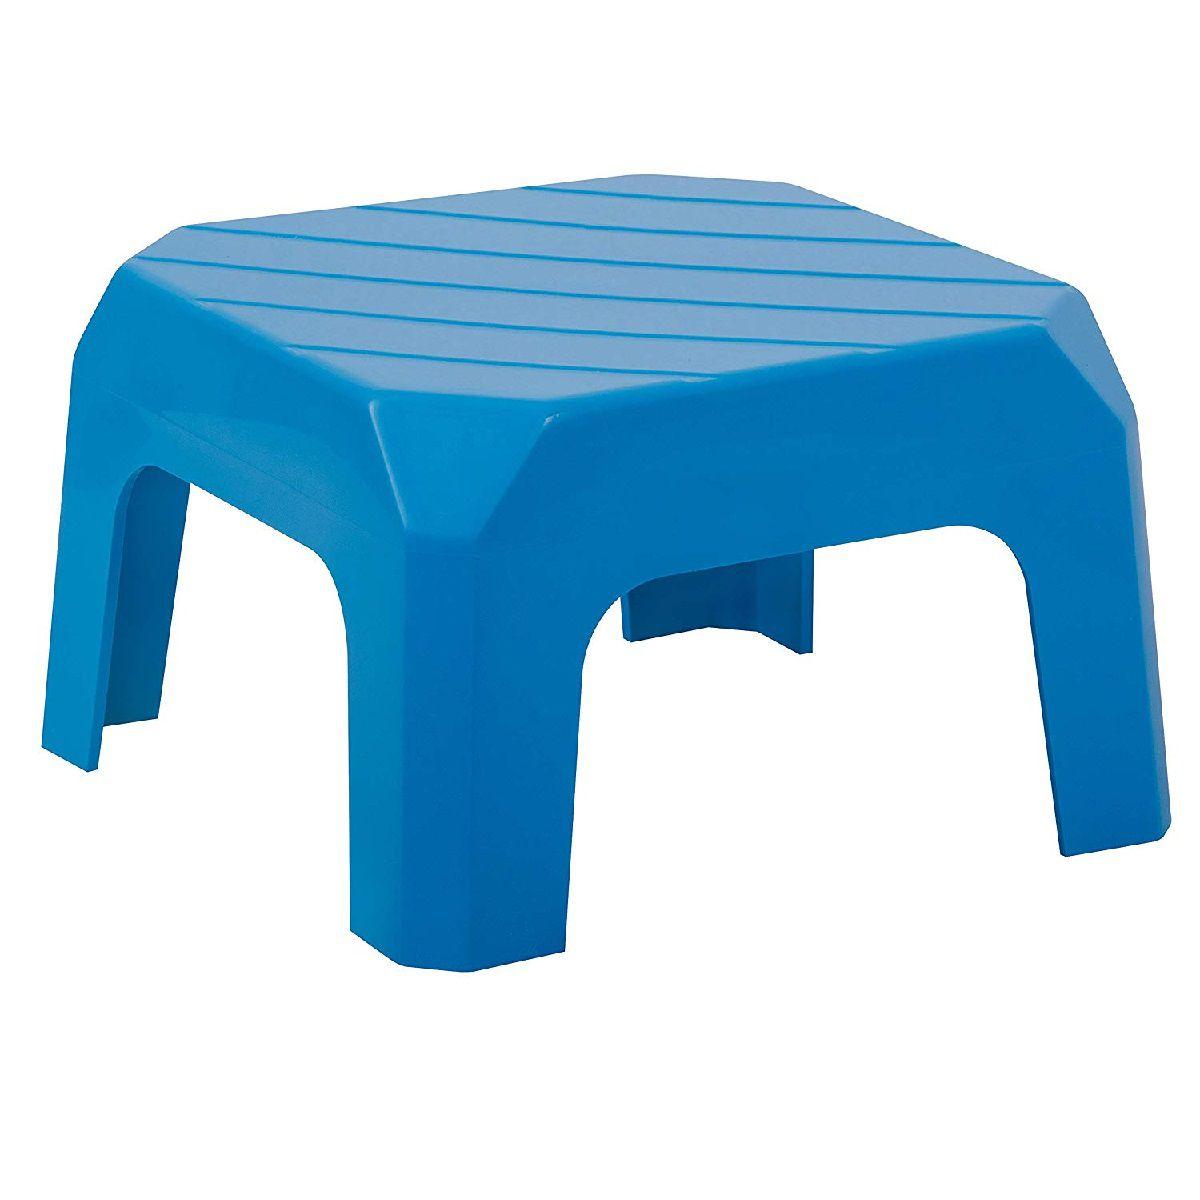 Mini Banqueta Plástica 20cm Azul Astra Bf2/r*bbr